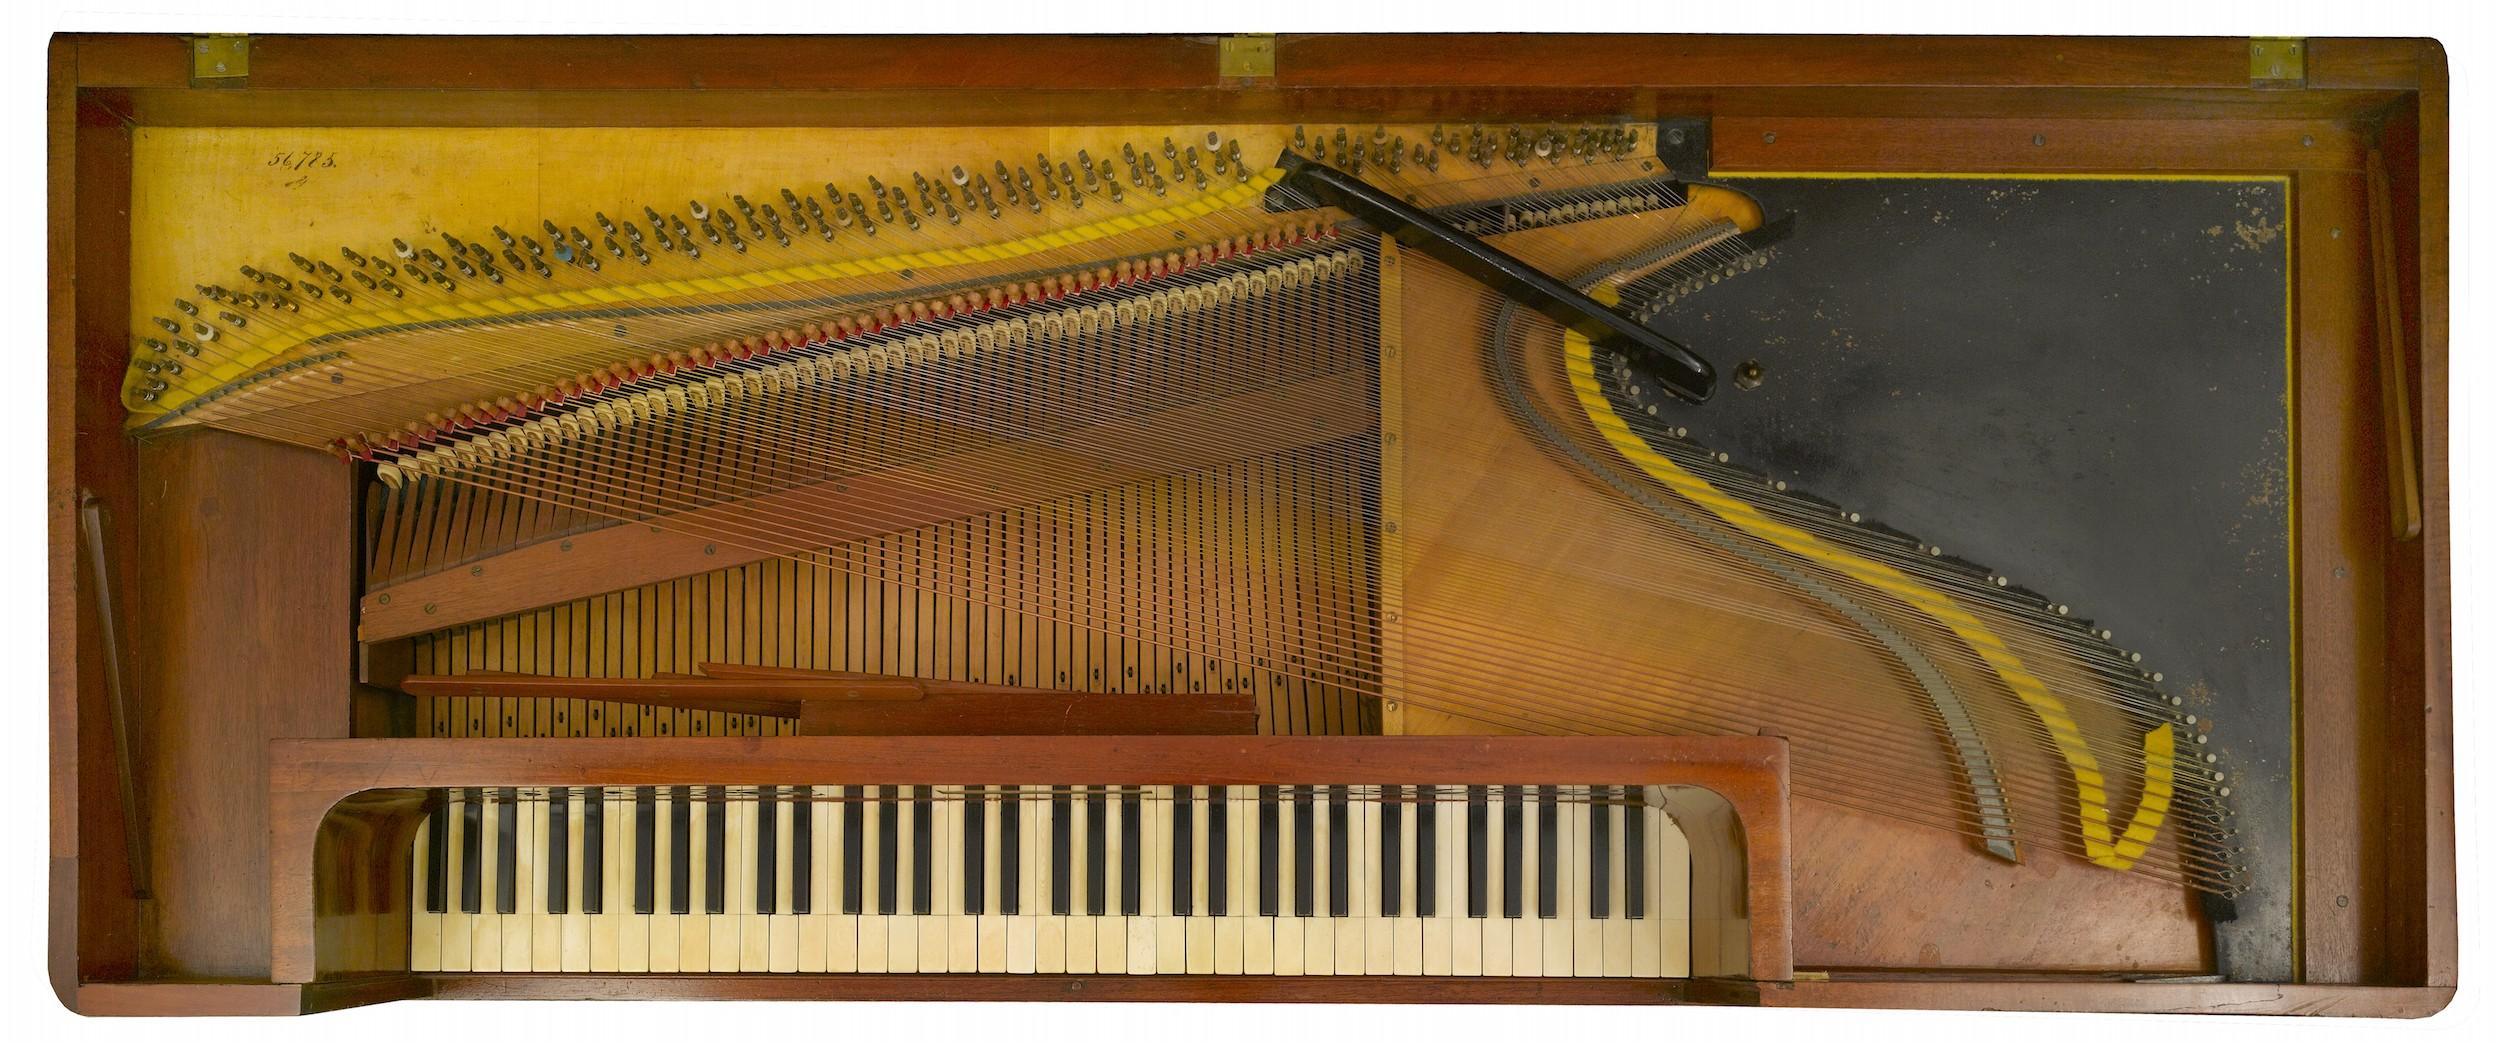 31 Elgar's Piano, strings